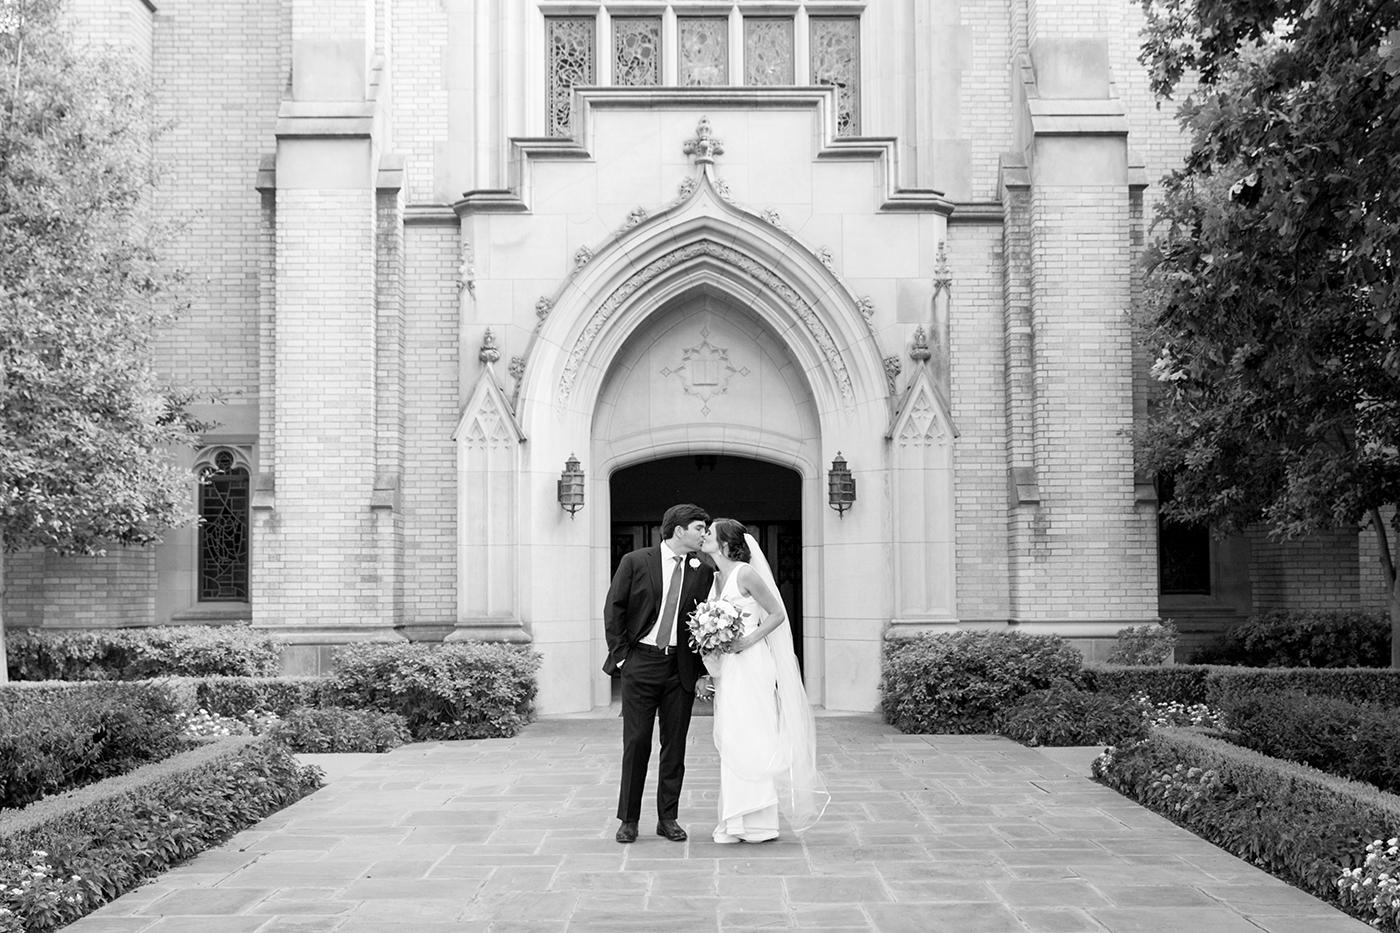 Wedding Planner Dallas TX - Allday Events - Highland Park - Marie Gabrielle Wedding - 262.jpg